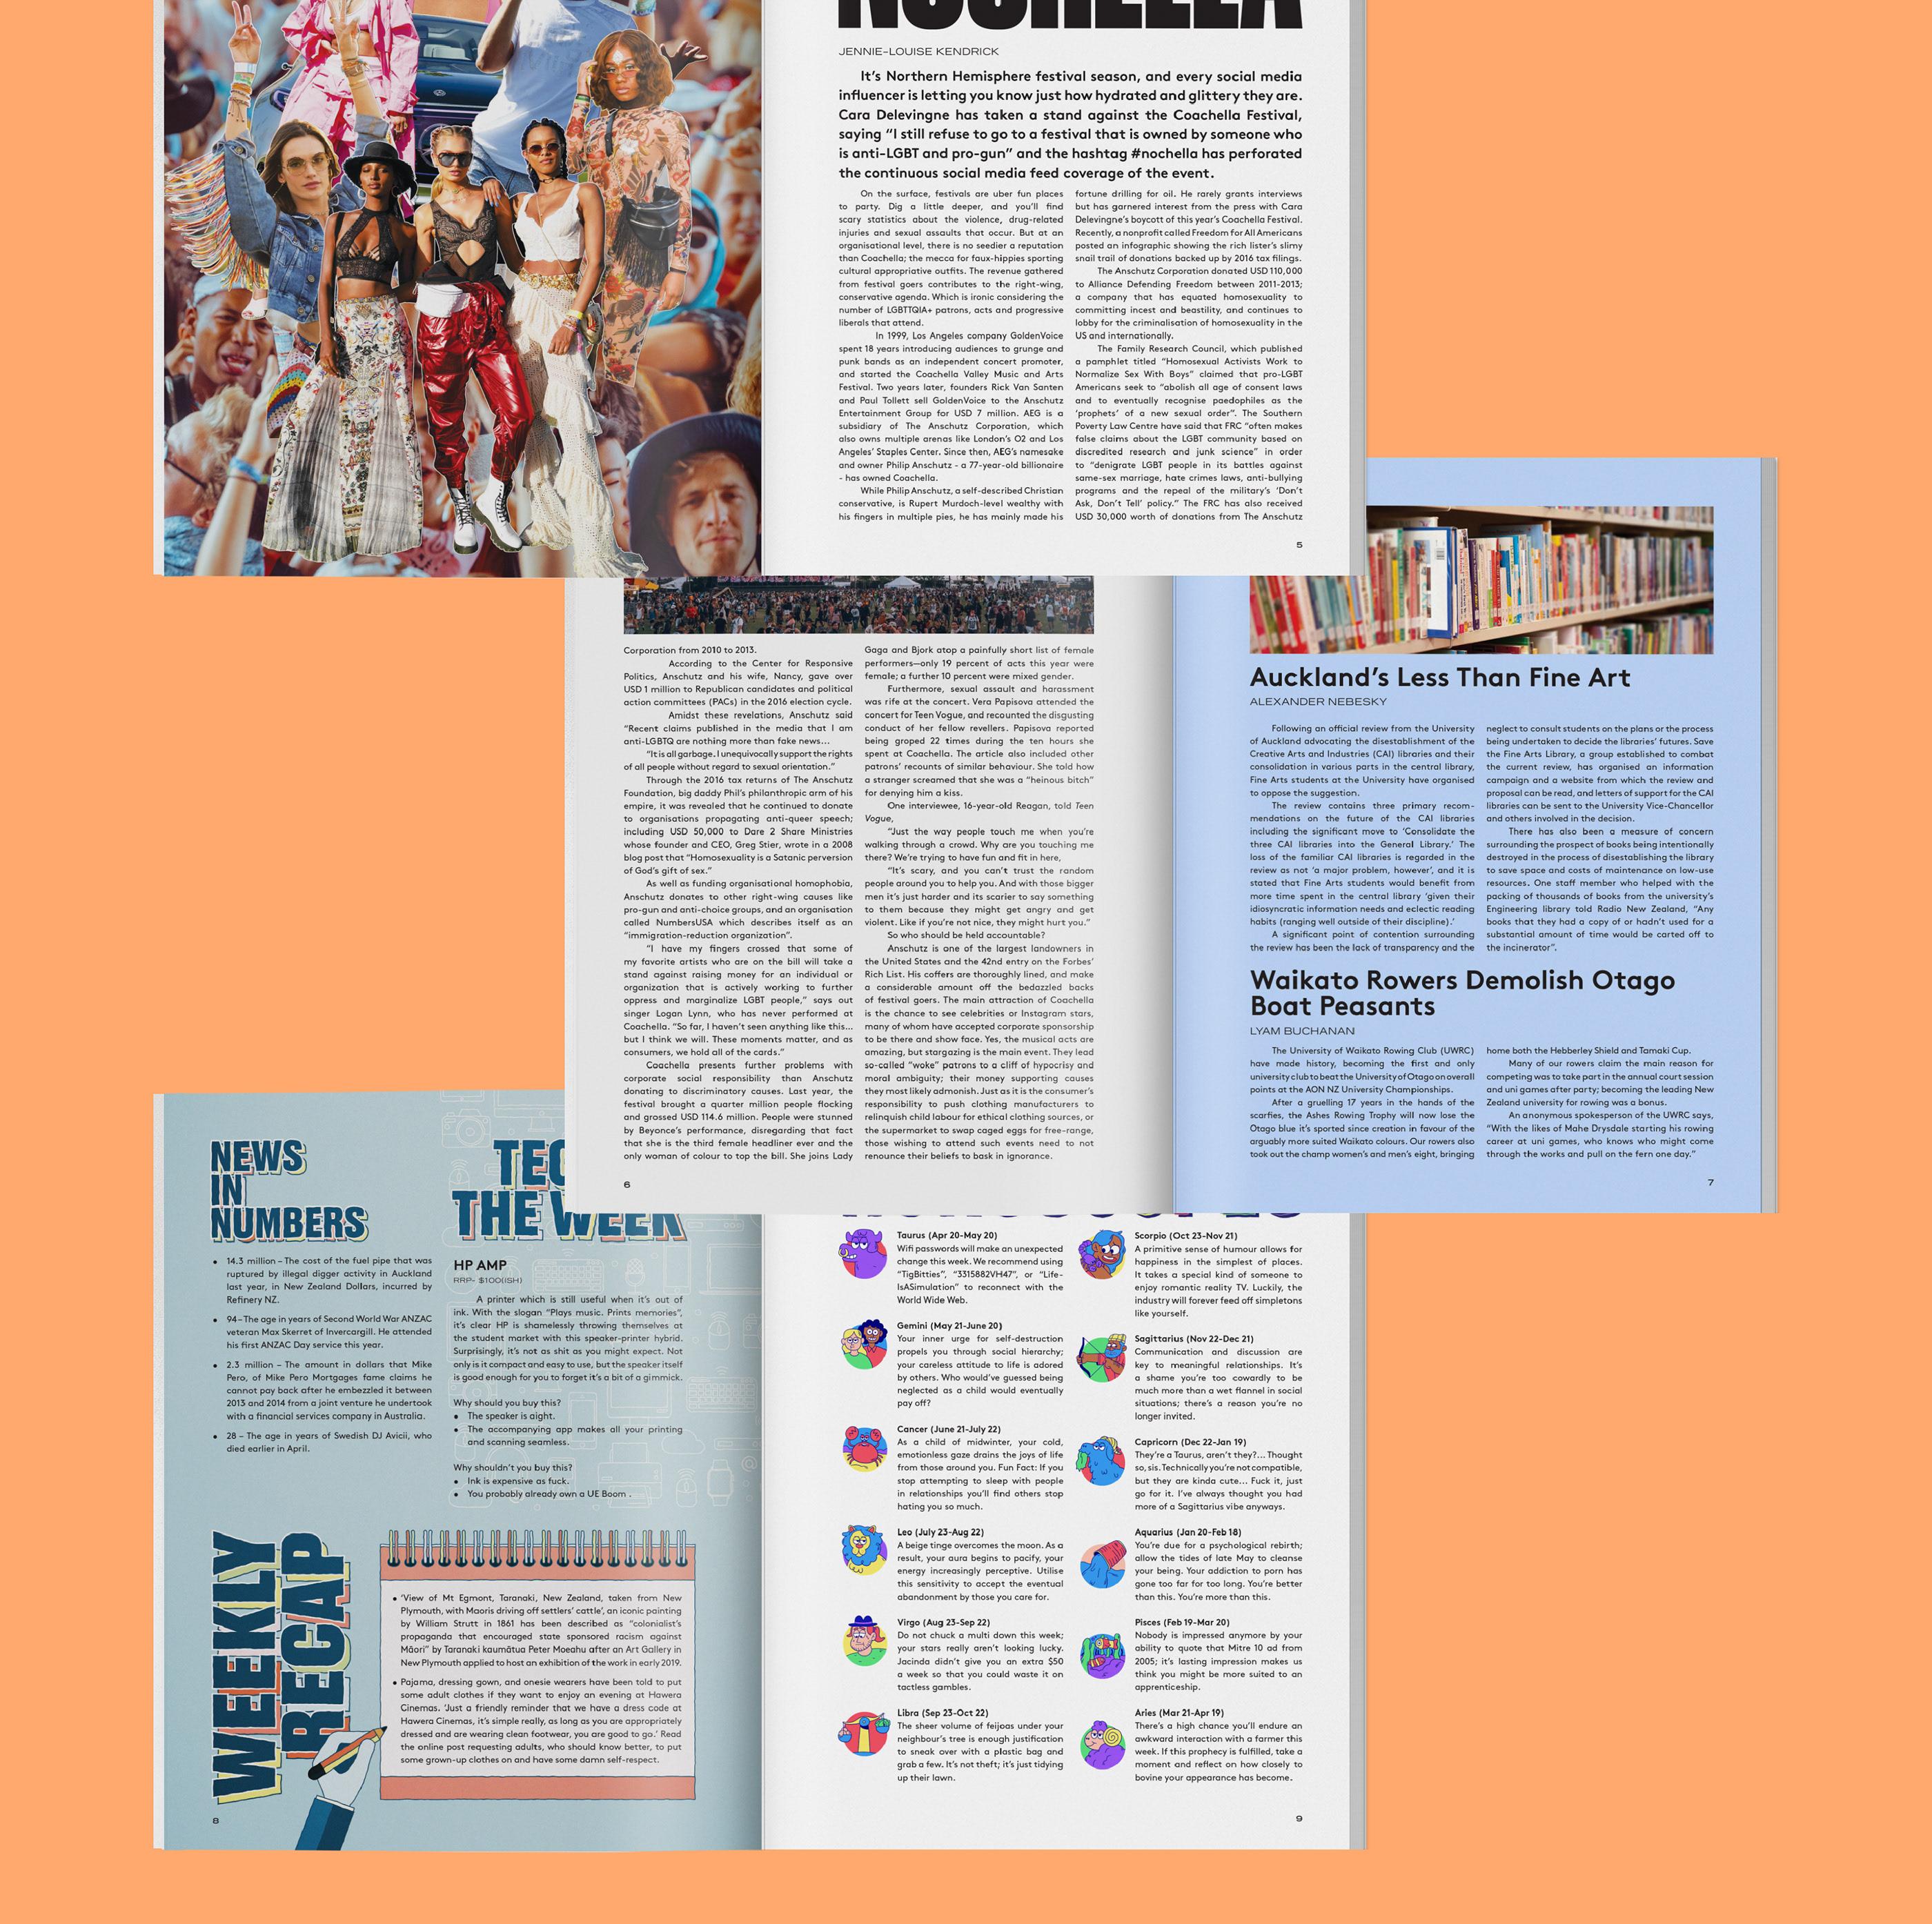 Nexus Magazine Issue 08 on Behance